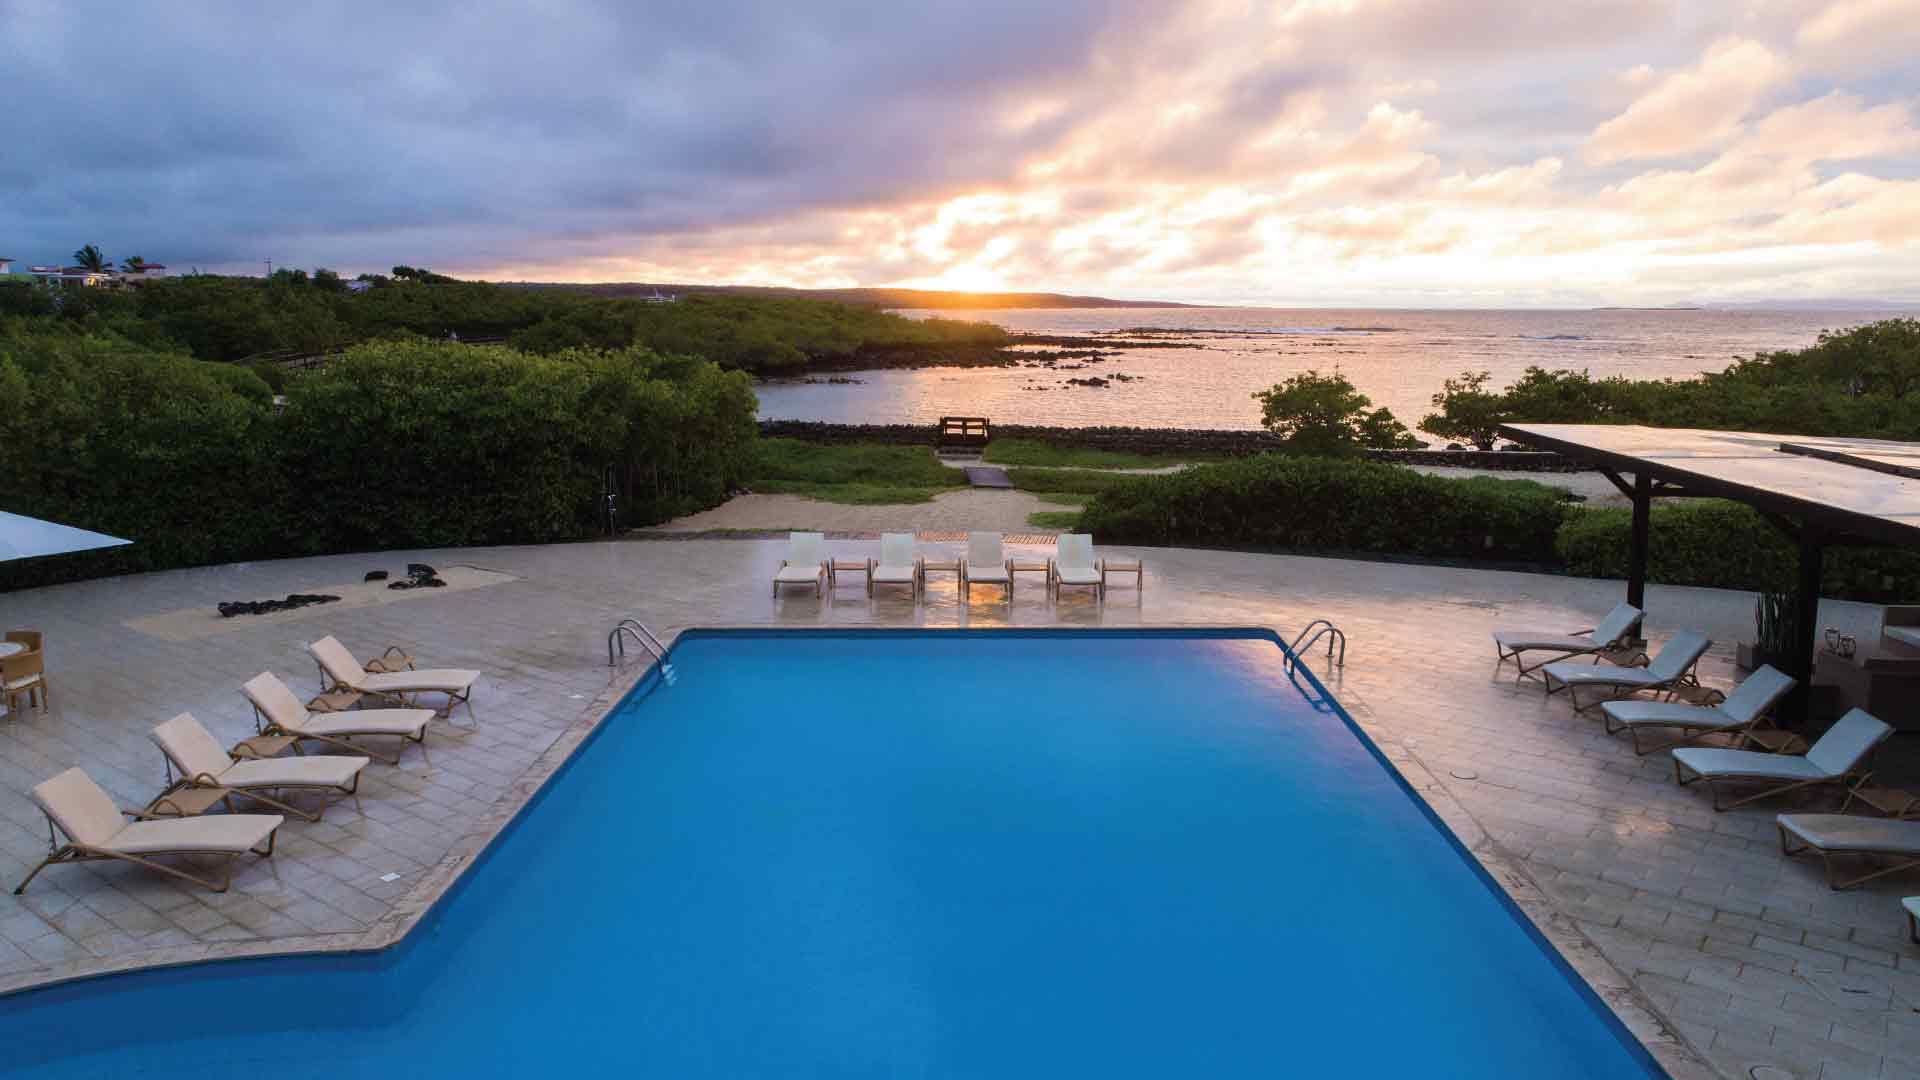 finch bay hotel galapagos swimming pool